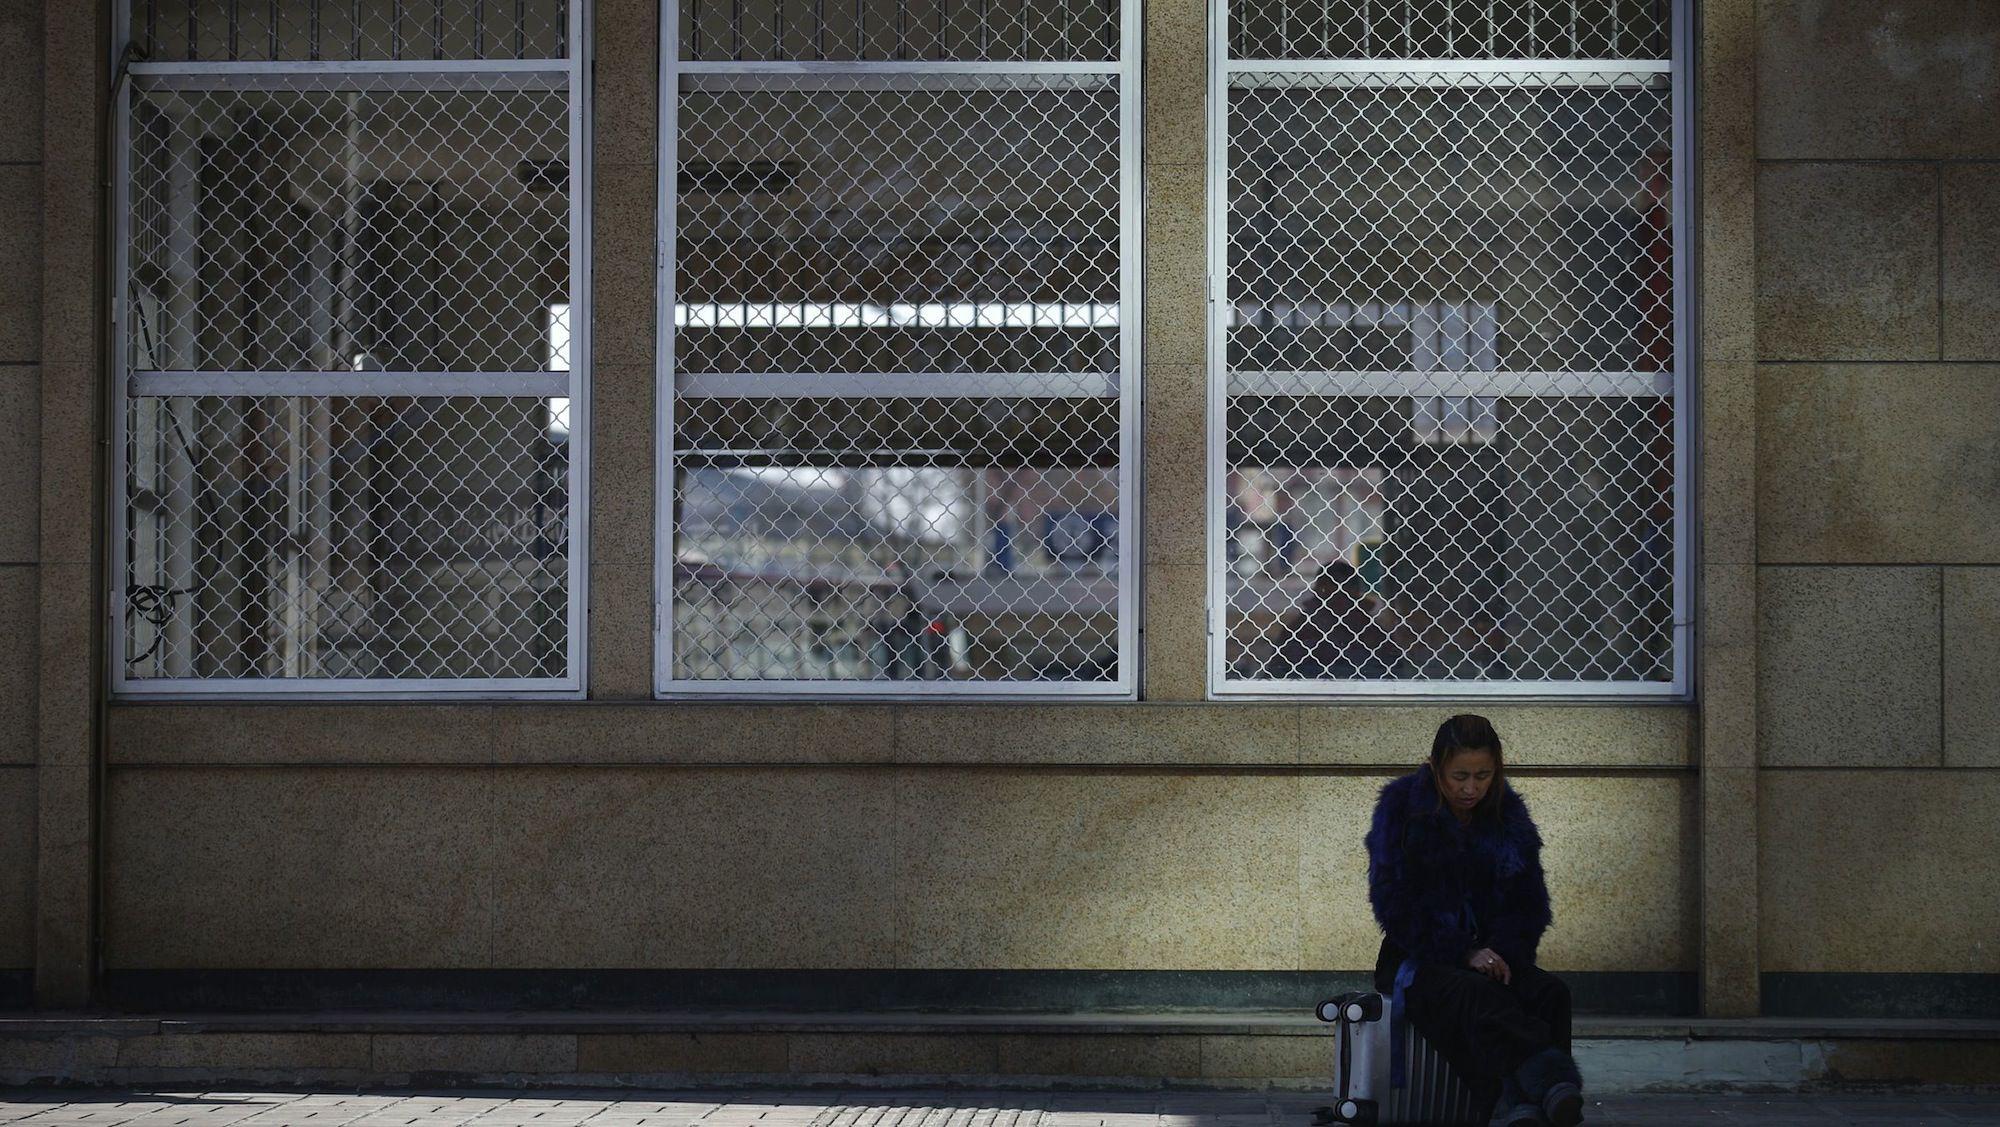 beijing railway station web